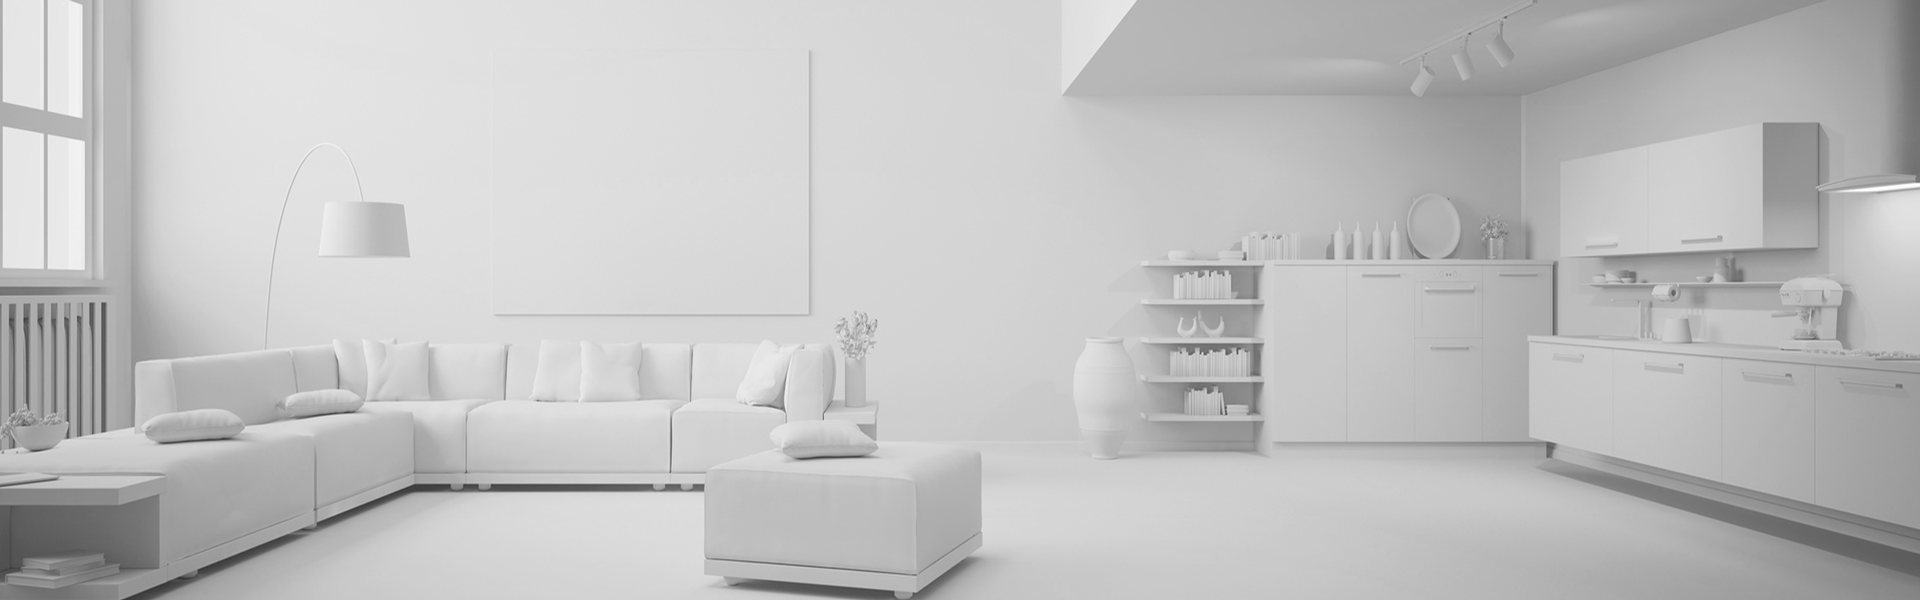 atelier leben s raum. Black Bedroom Furniture Sets. Home Design Ideas